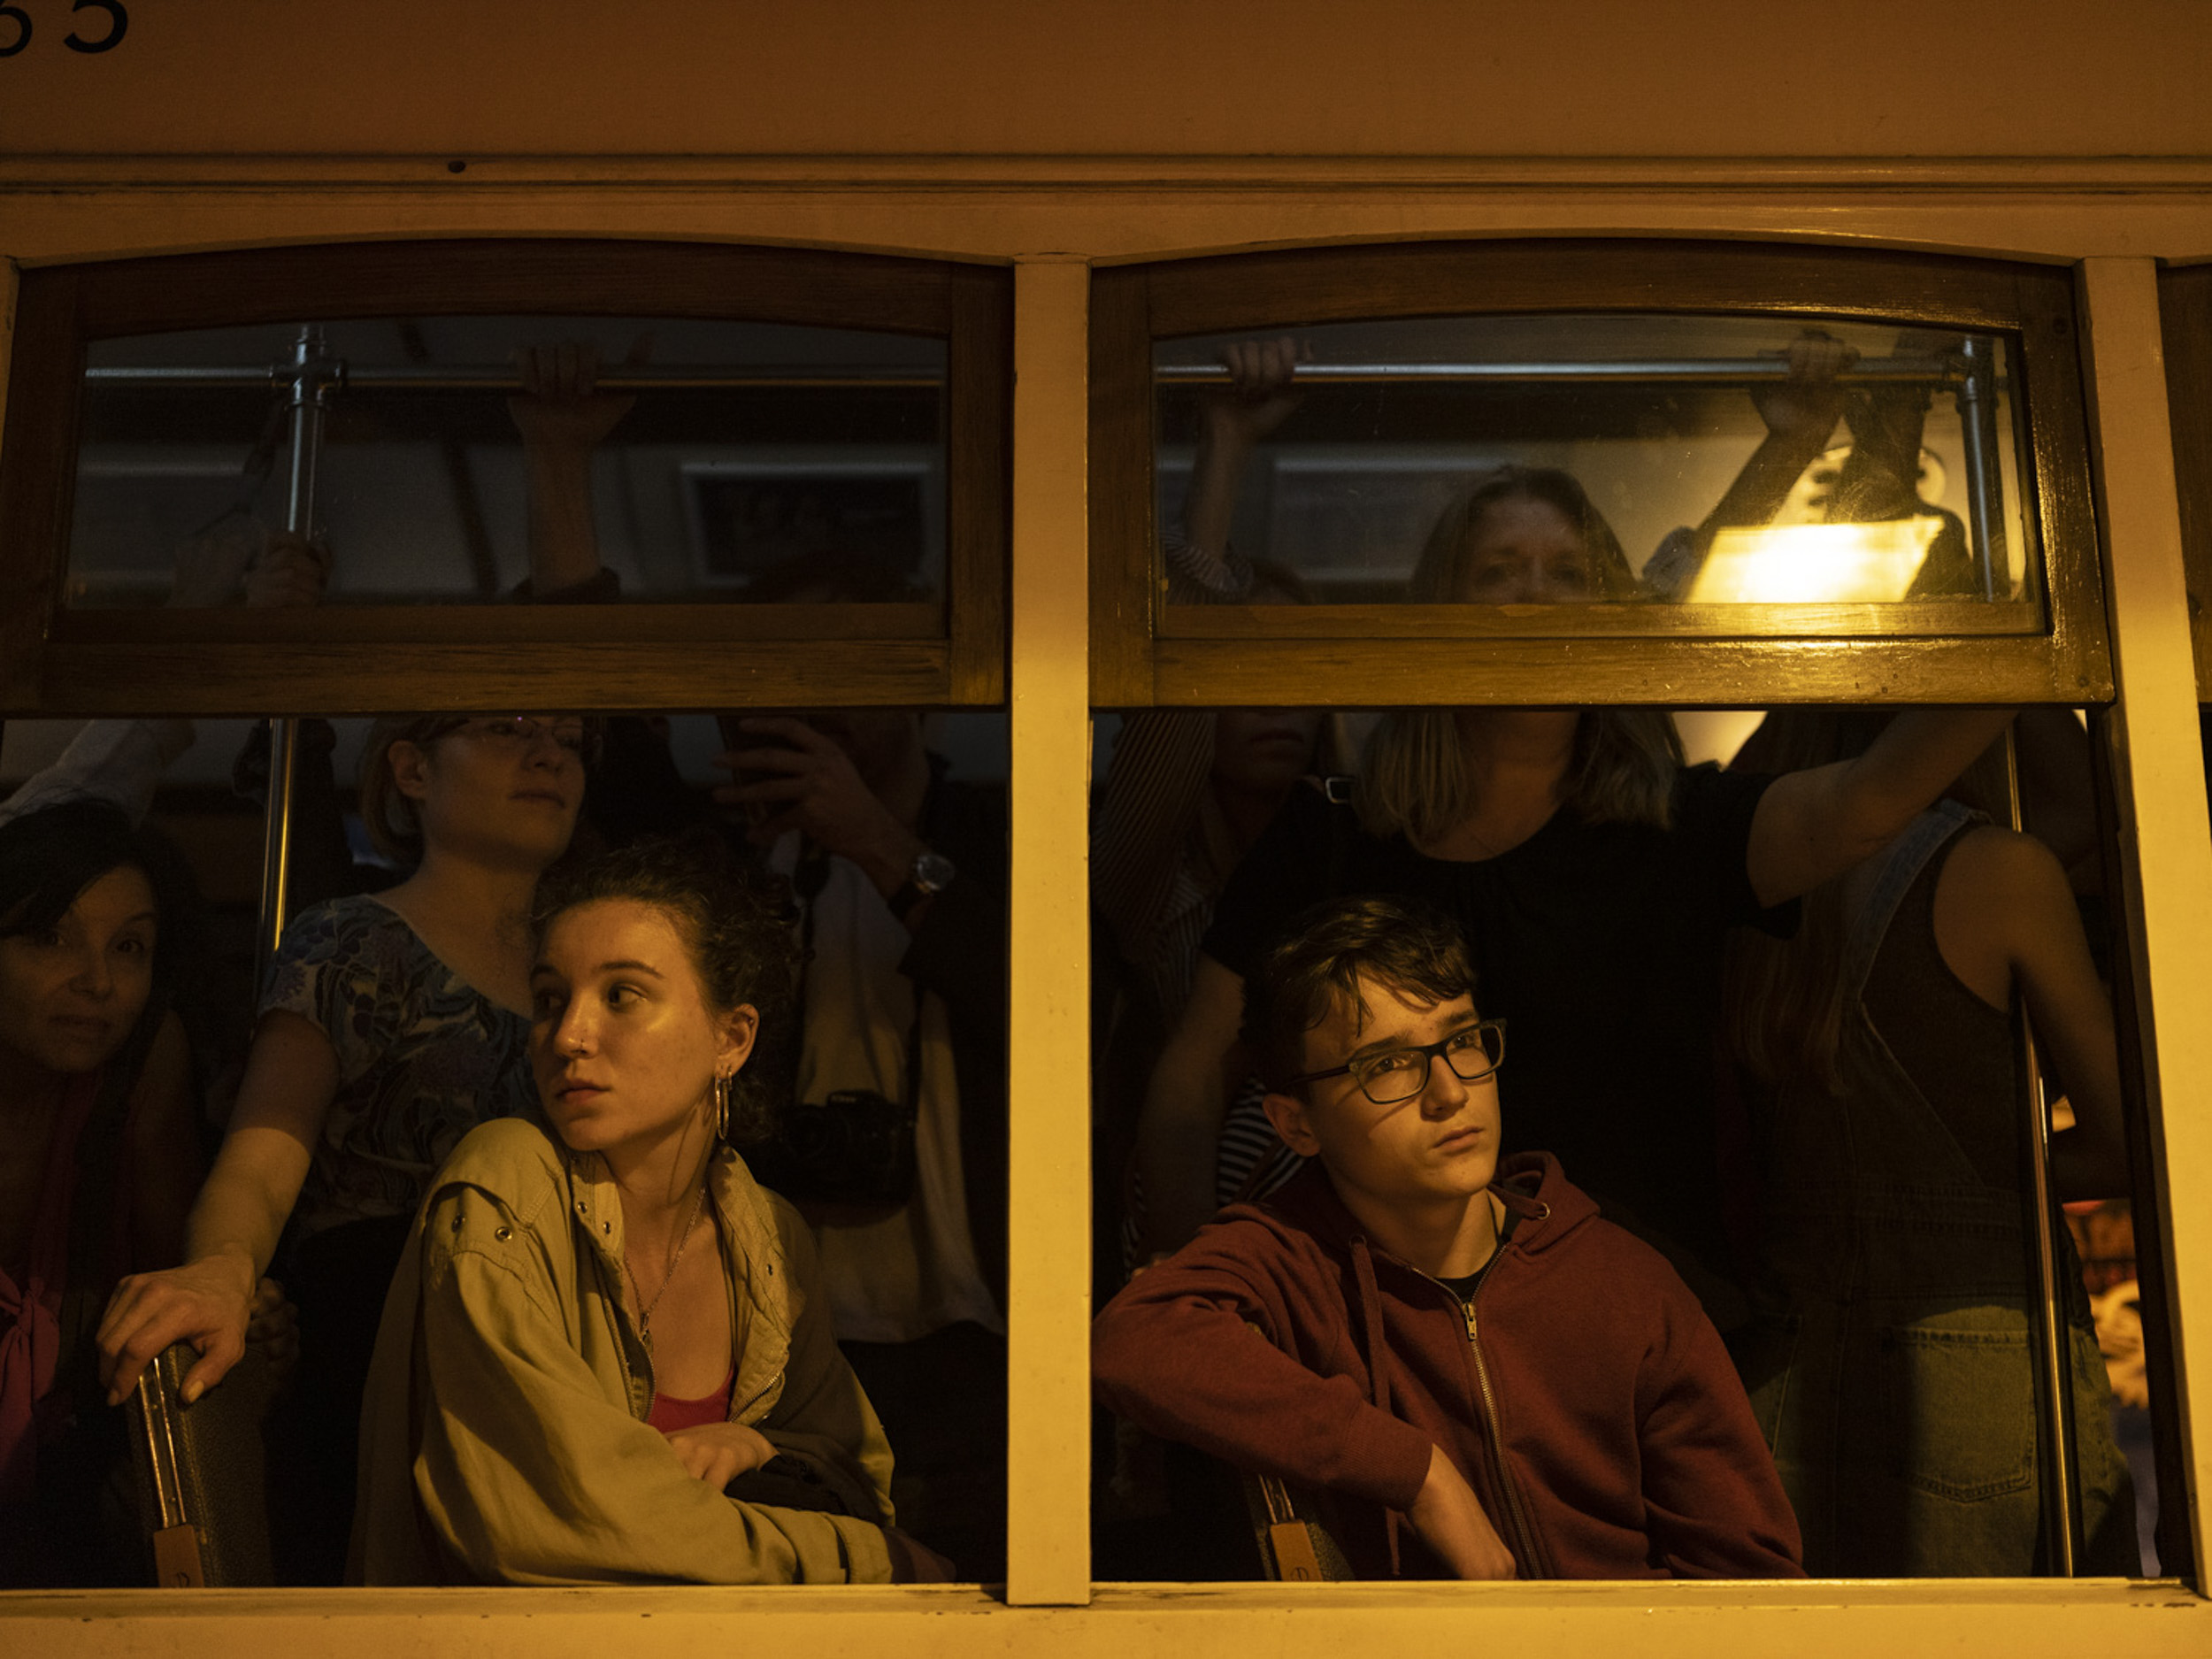 Taller de fotografía de calle en Oporto.